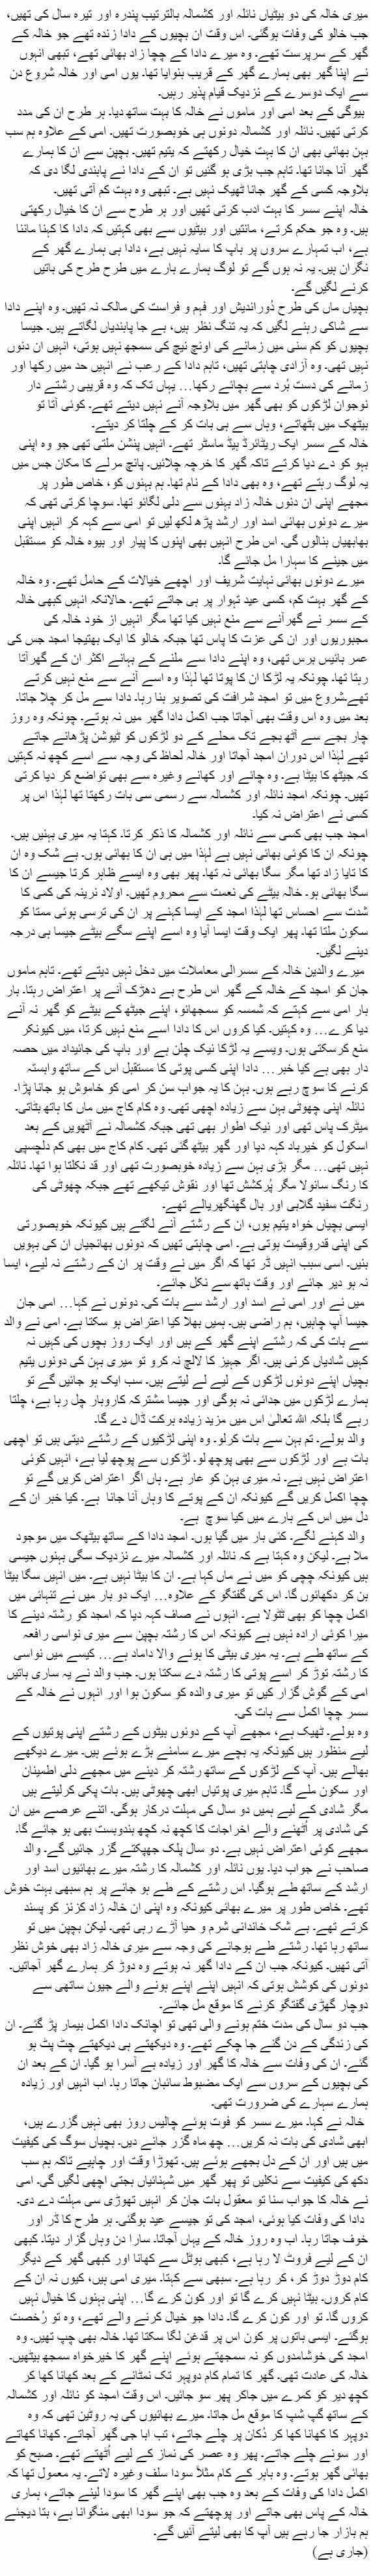 Yeh Waqt Badalta Hei-2